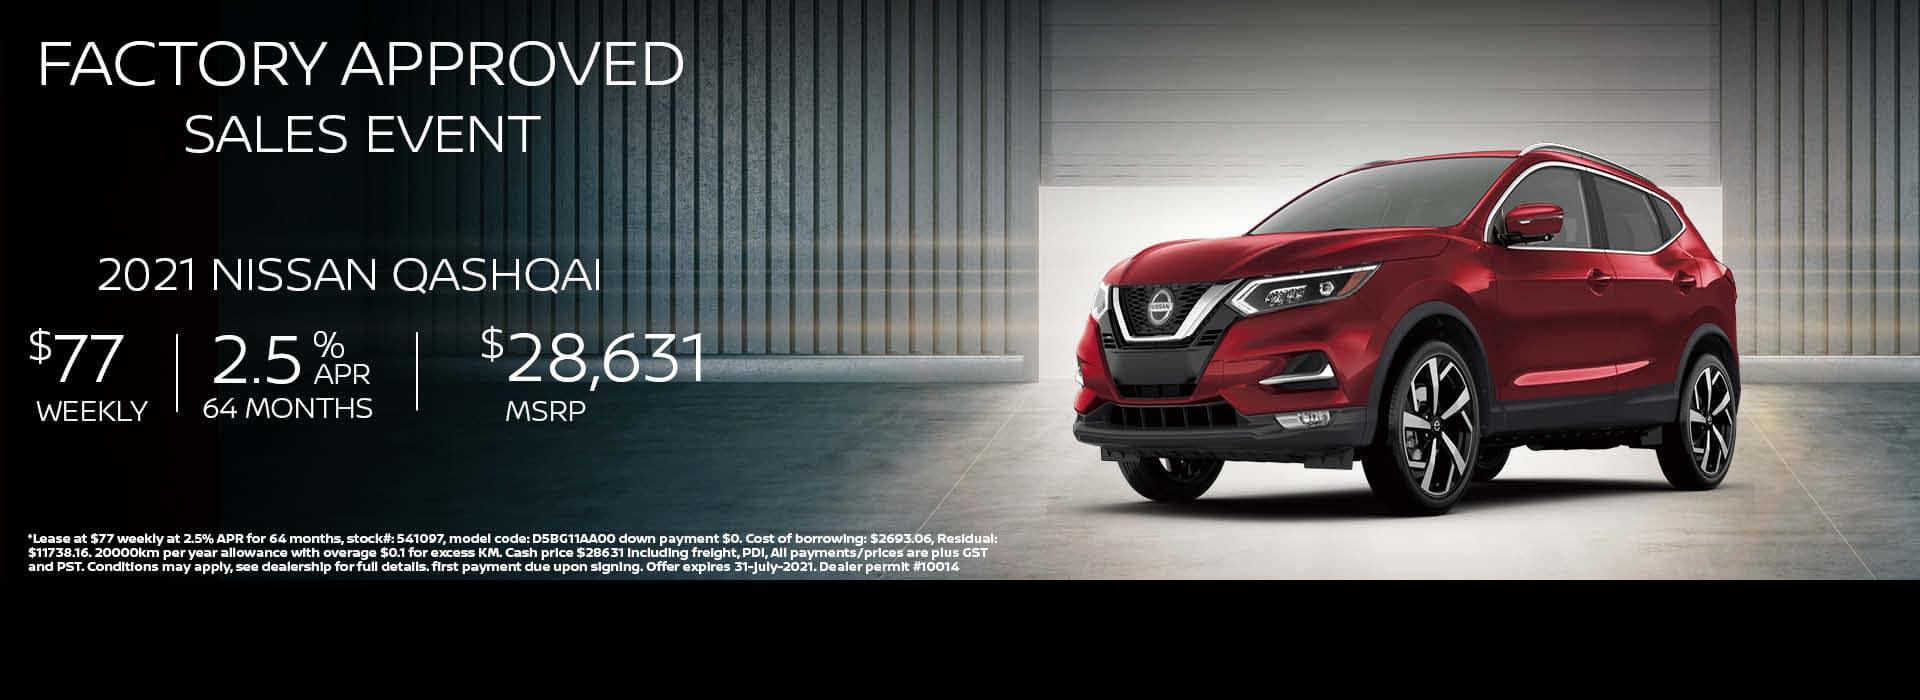 2021_Nissan_Qashqai_Desktop_Home_Page_Banner_July2021